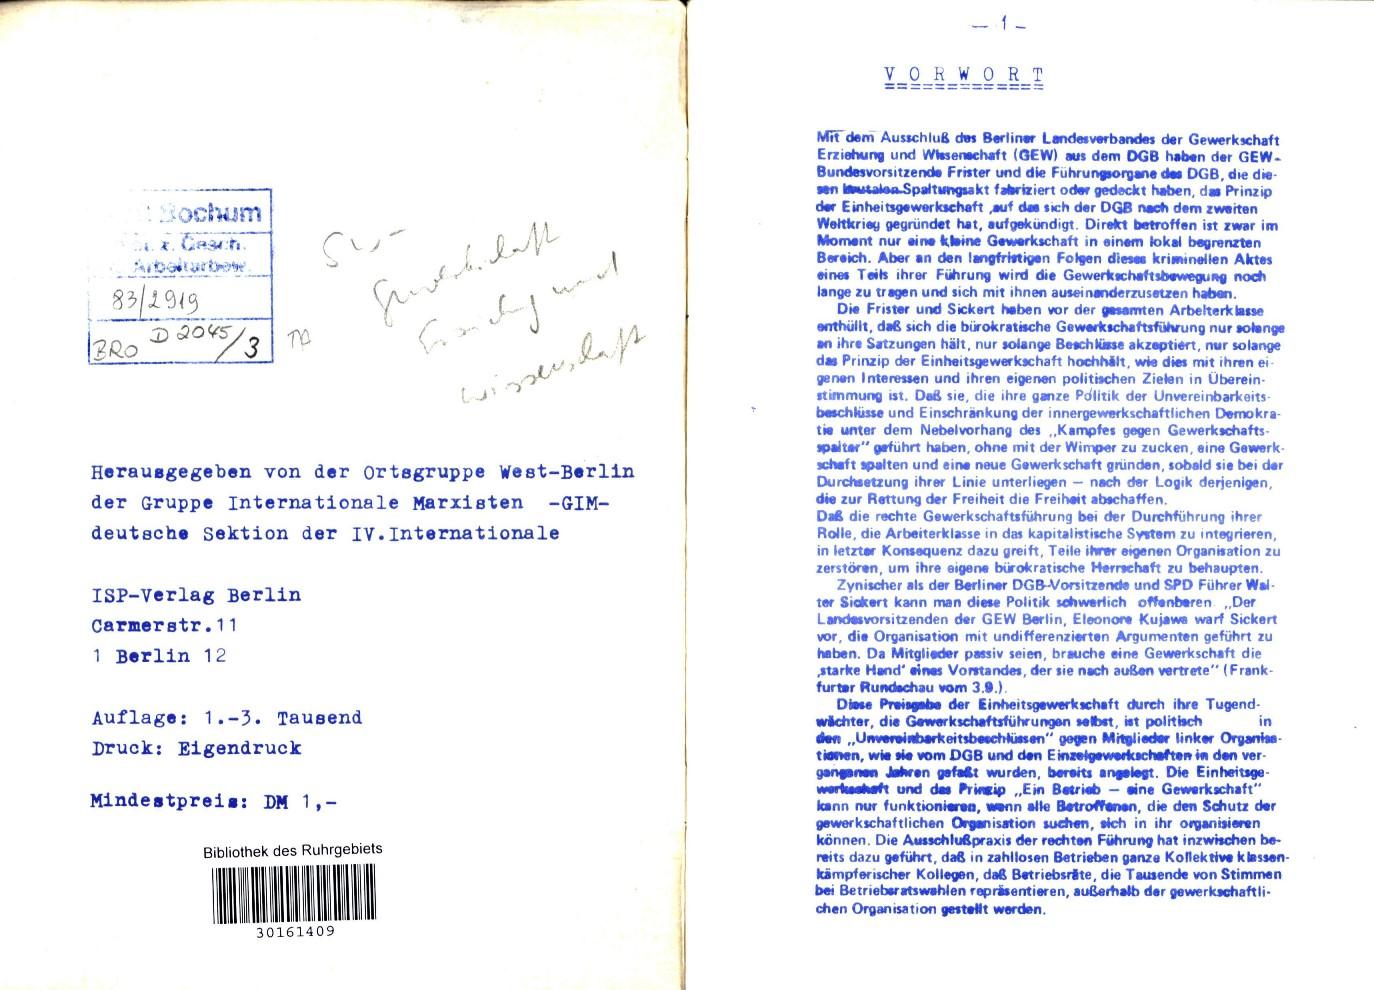 Berlin_GIM_1976_Zum_Fall_GEW_02